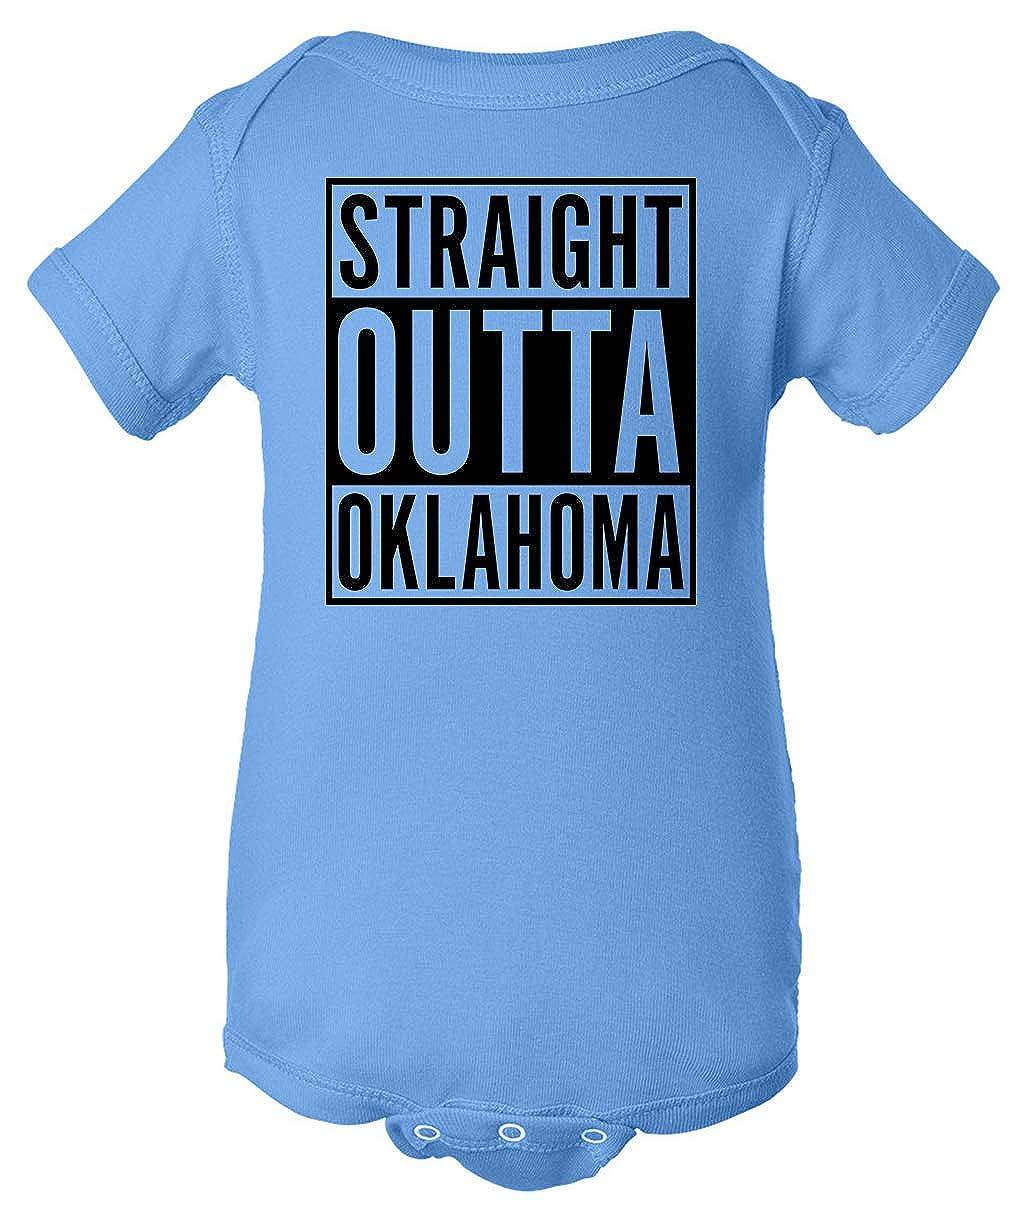 Tenacitee Babys Straight Outta Oklahoma Shirt